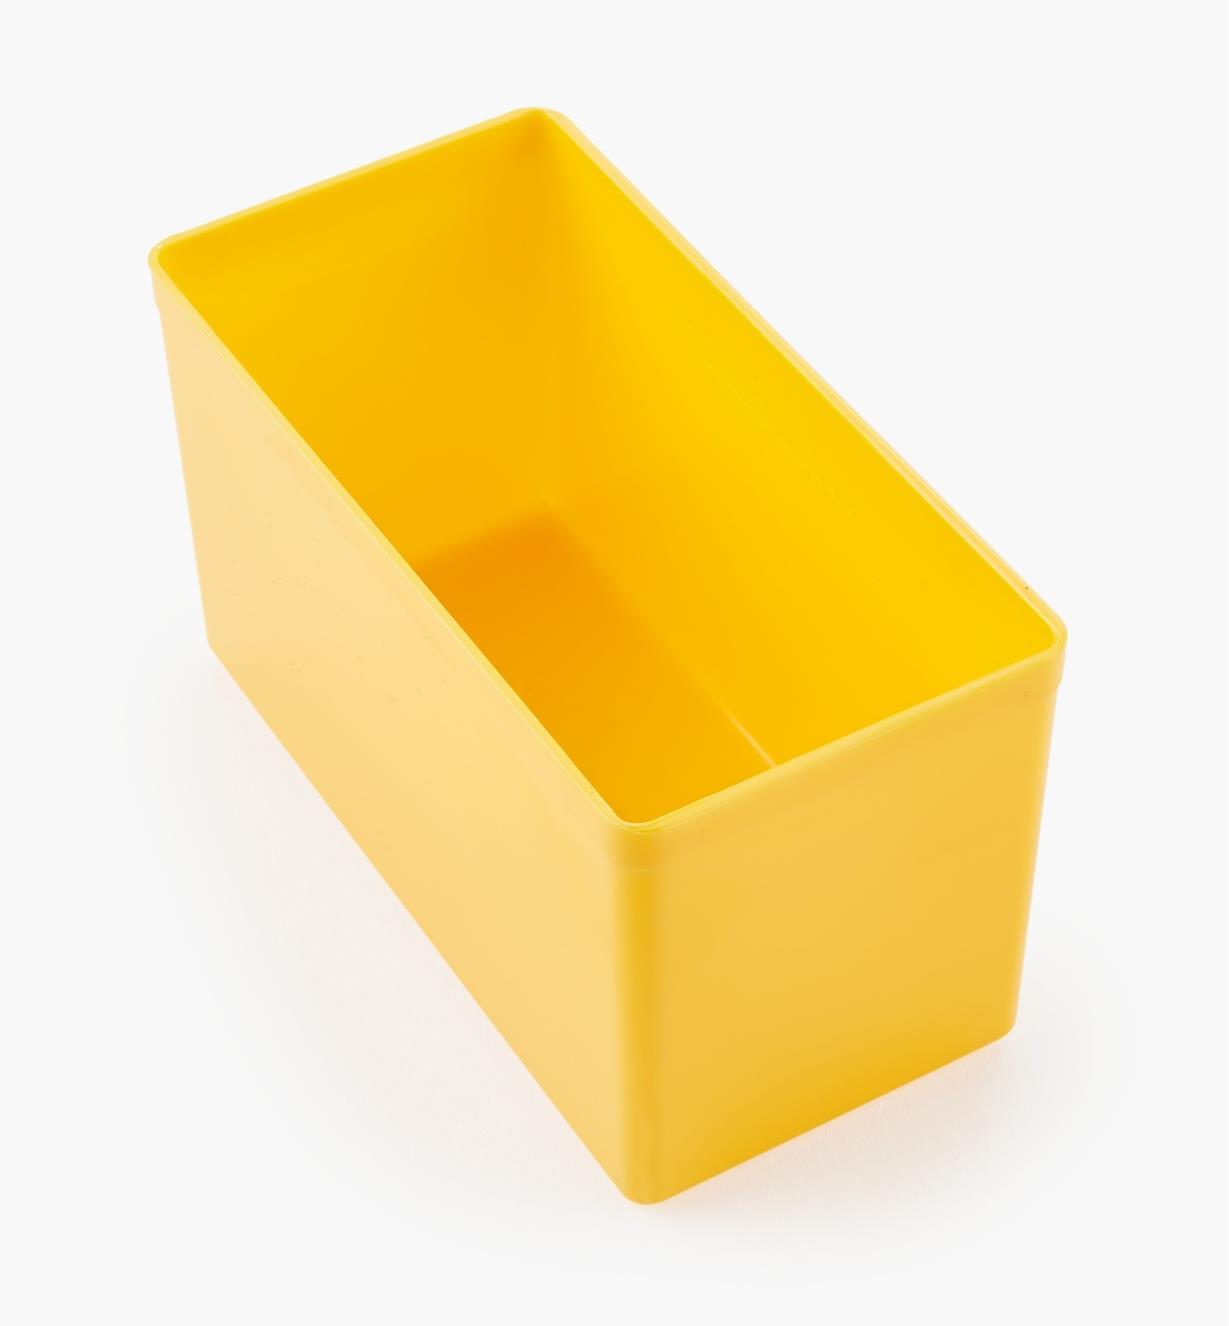 27K8022 - Godet jaune de 62 mm x 105 mm x 51 mm (2 7/16 po x 4 1/8 po x 2 po), l'unité